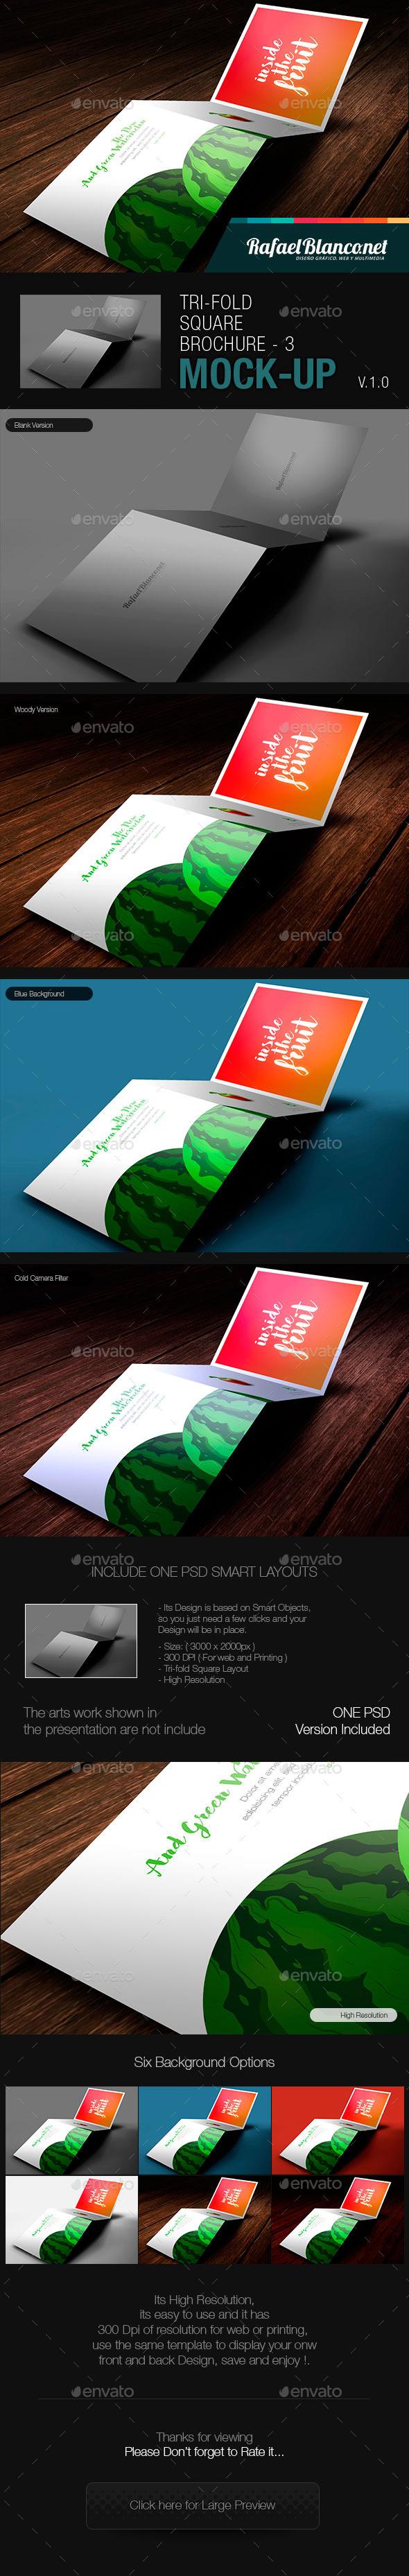 Tri-Fold Square Brochure Mock-up - 3 - Product Mock-Ups Graphics